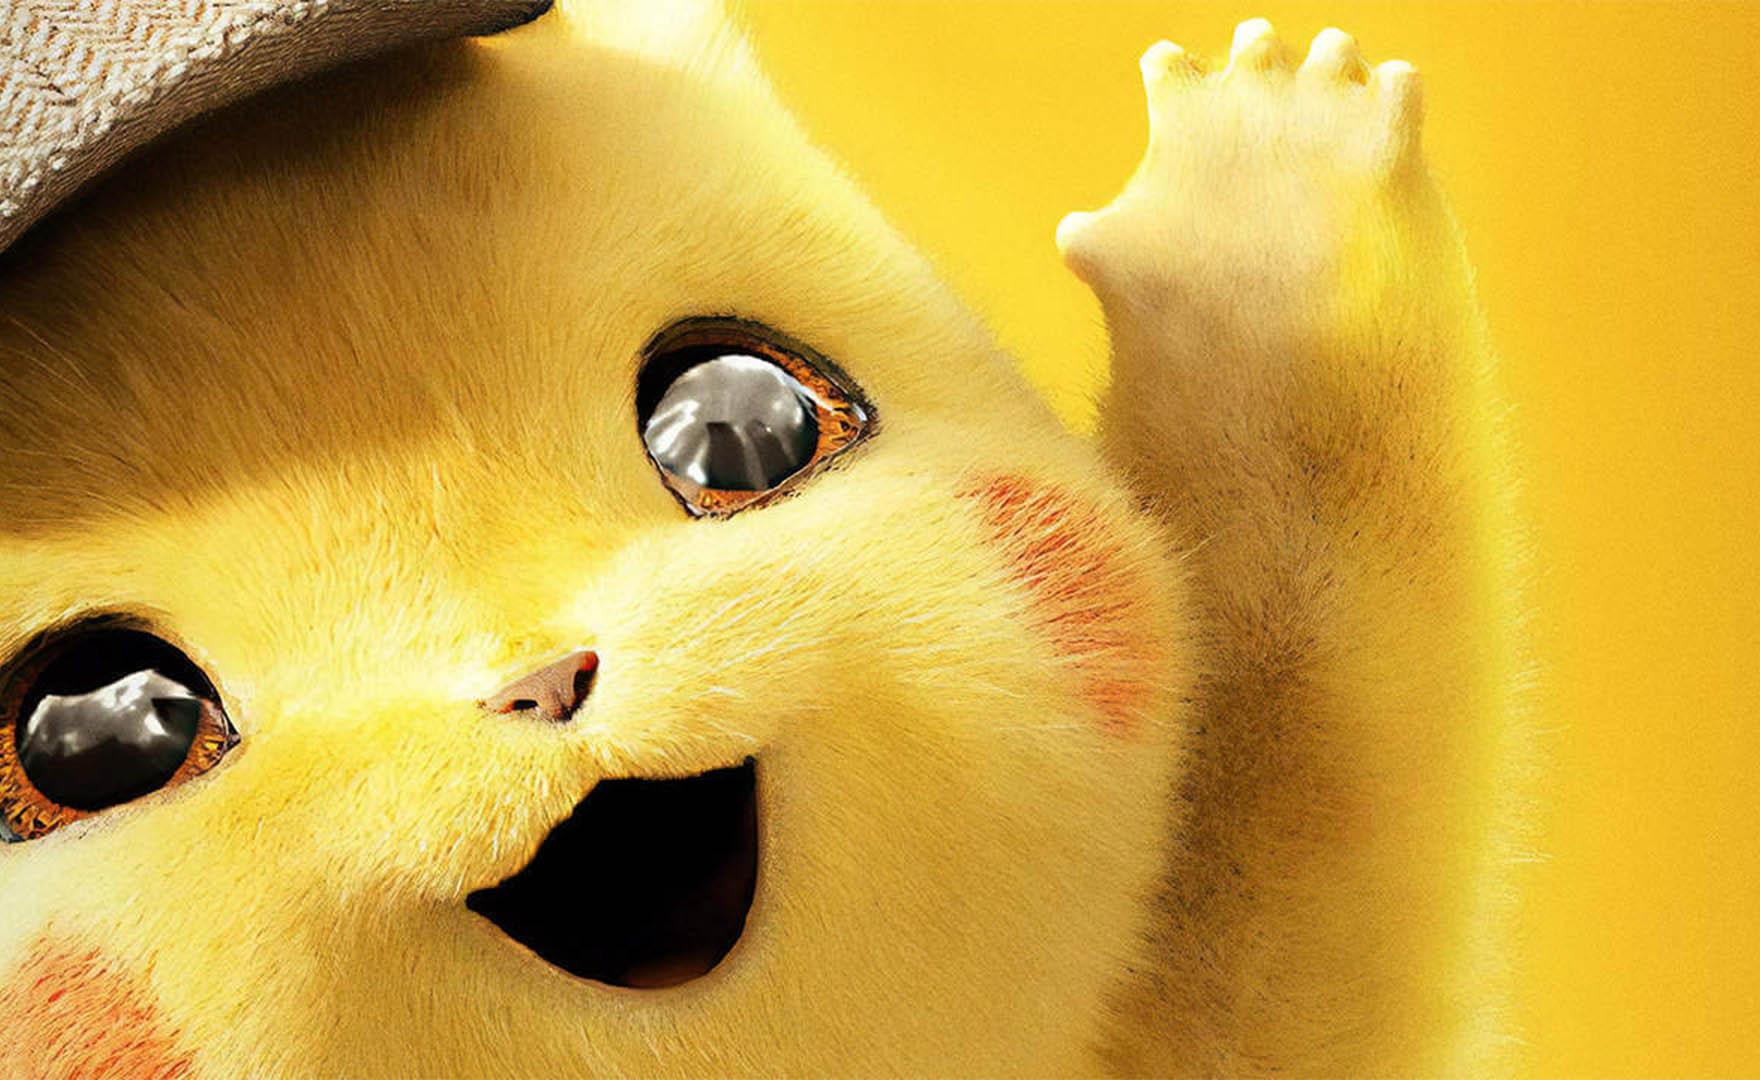 Pikachu protagonista del suo primo video ASMR